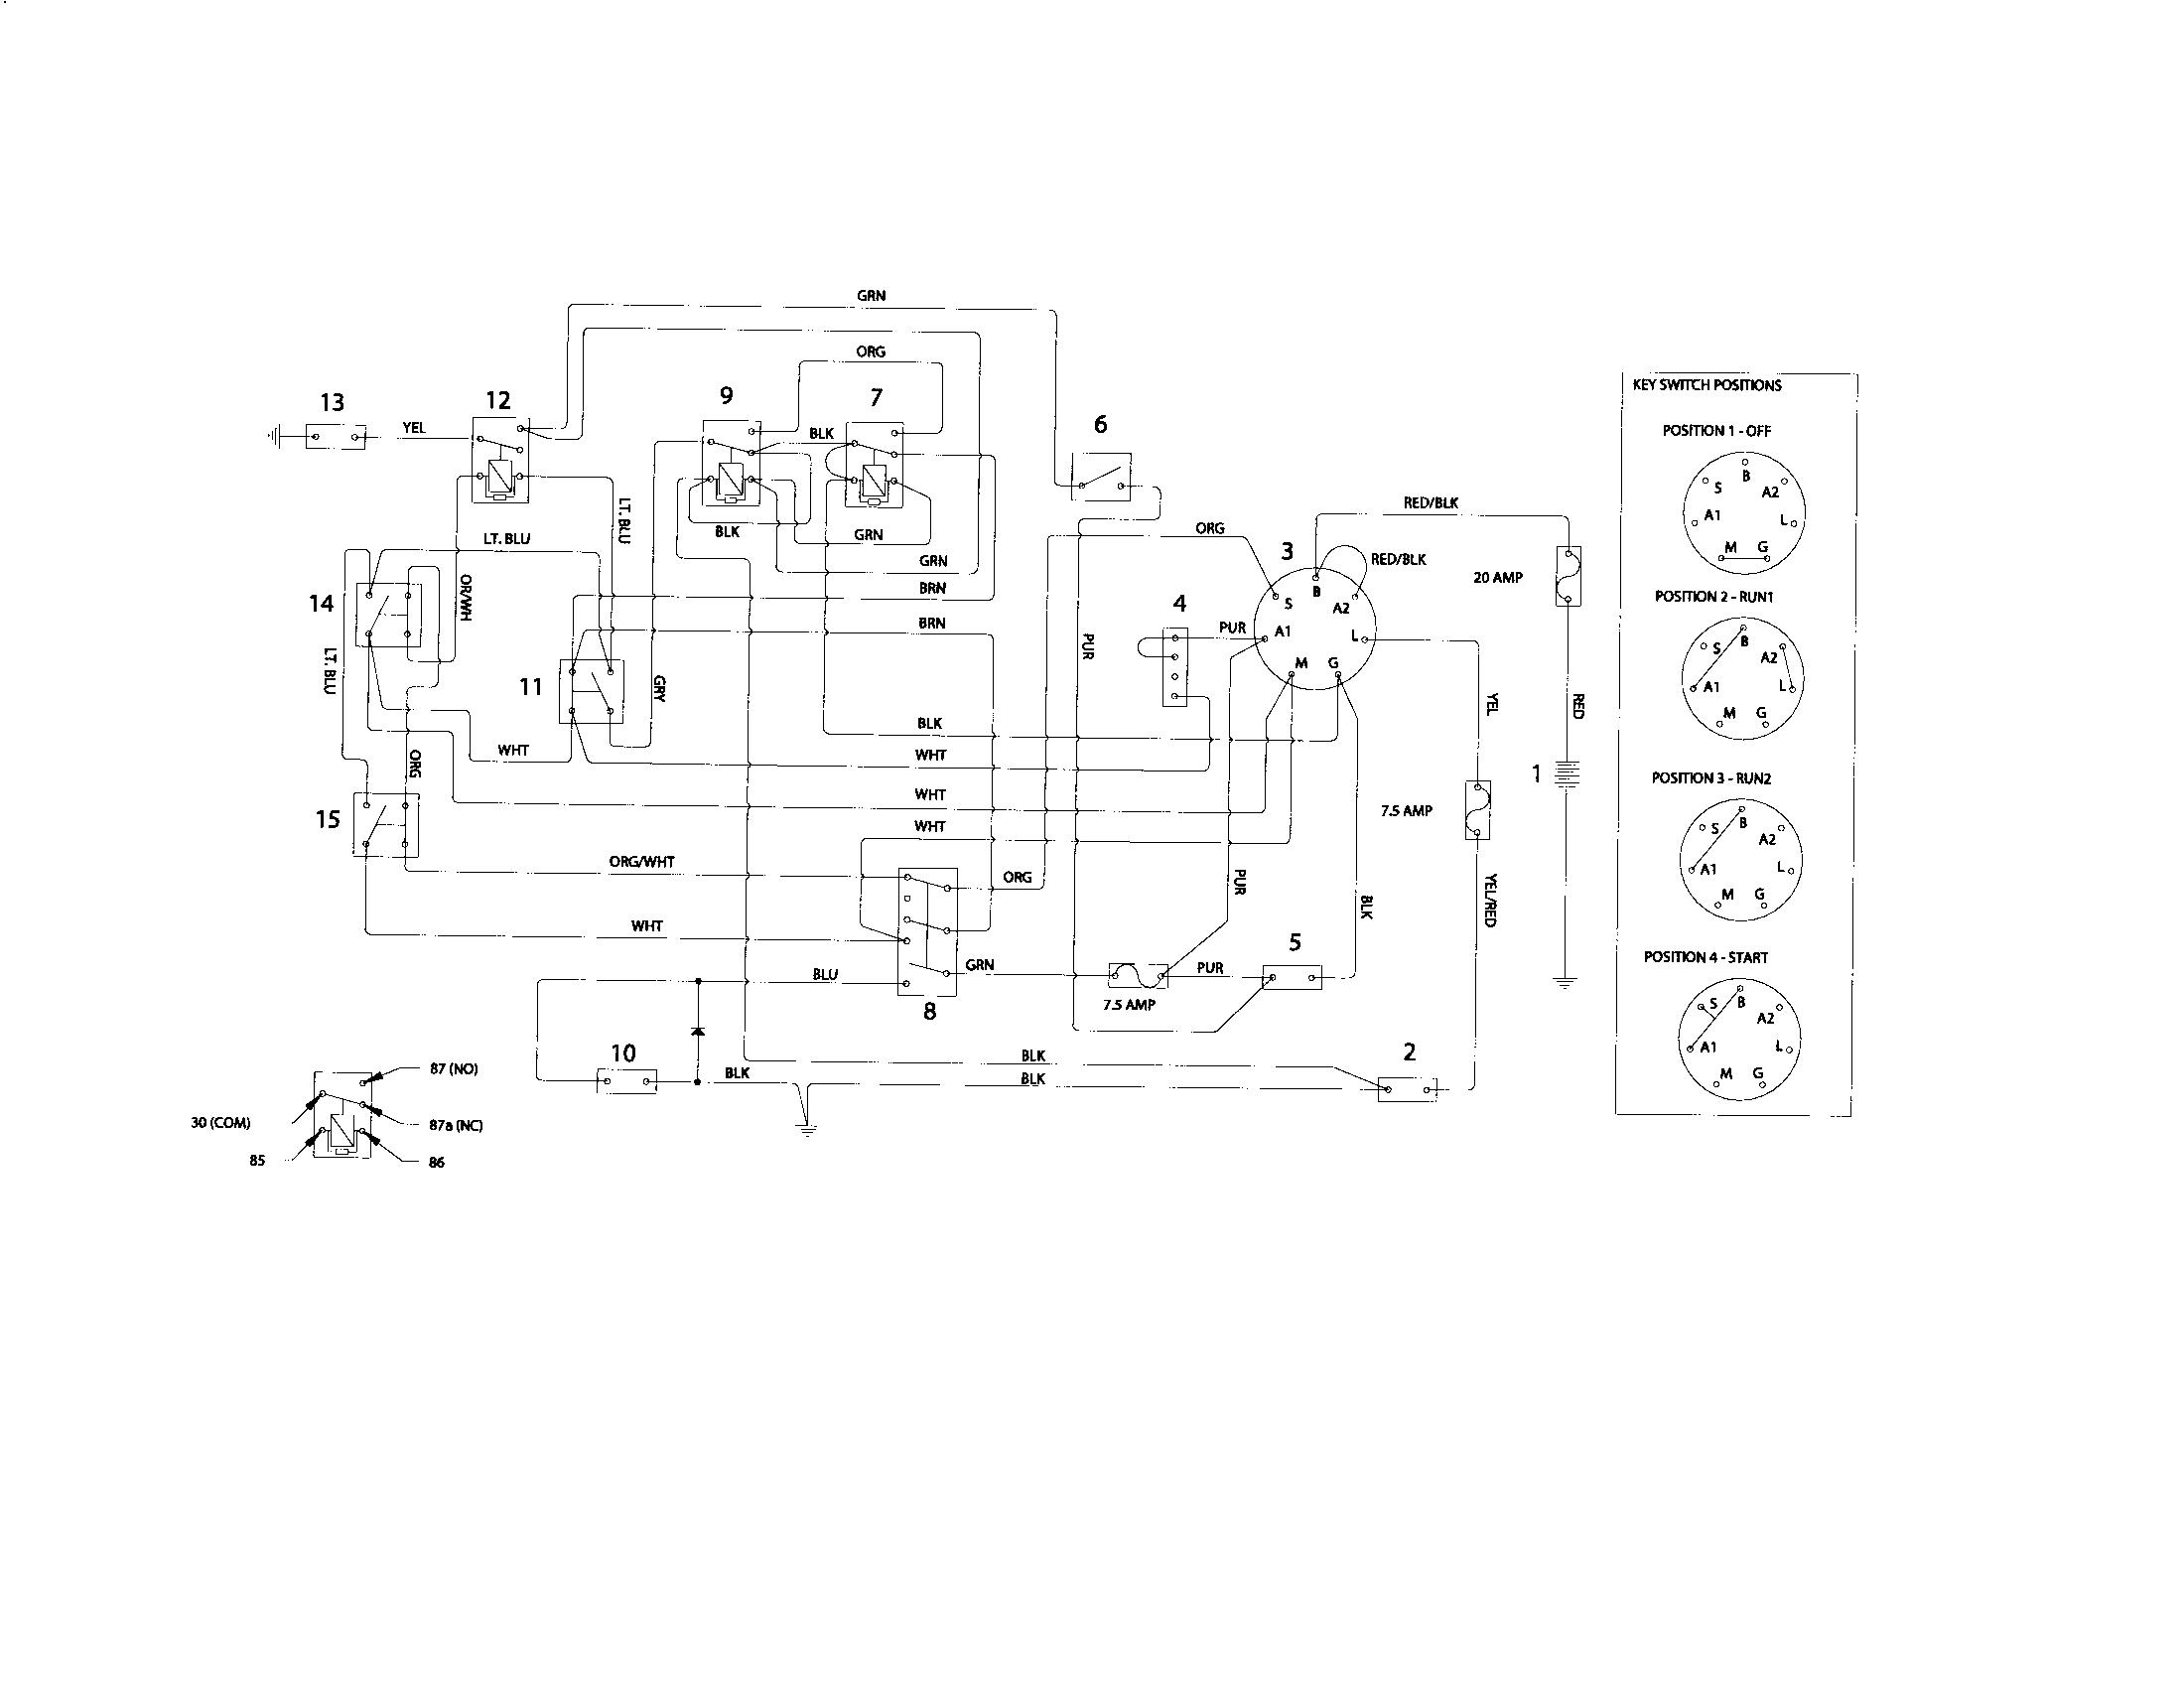 medium resolution of looking for husqvarna model z5426 968999508 rear engine riding mowerhusqvarna z5426 968999508 schematic diagram diagram